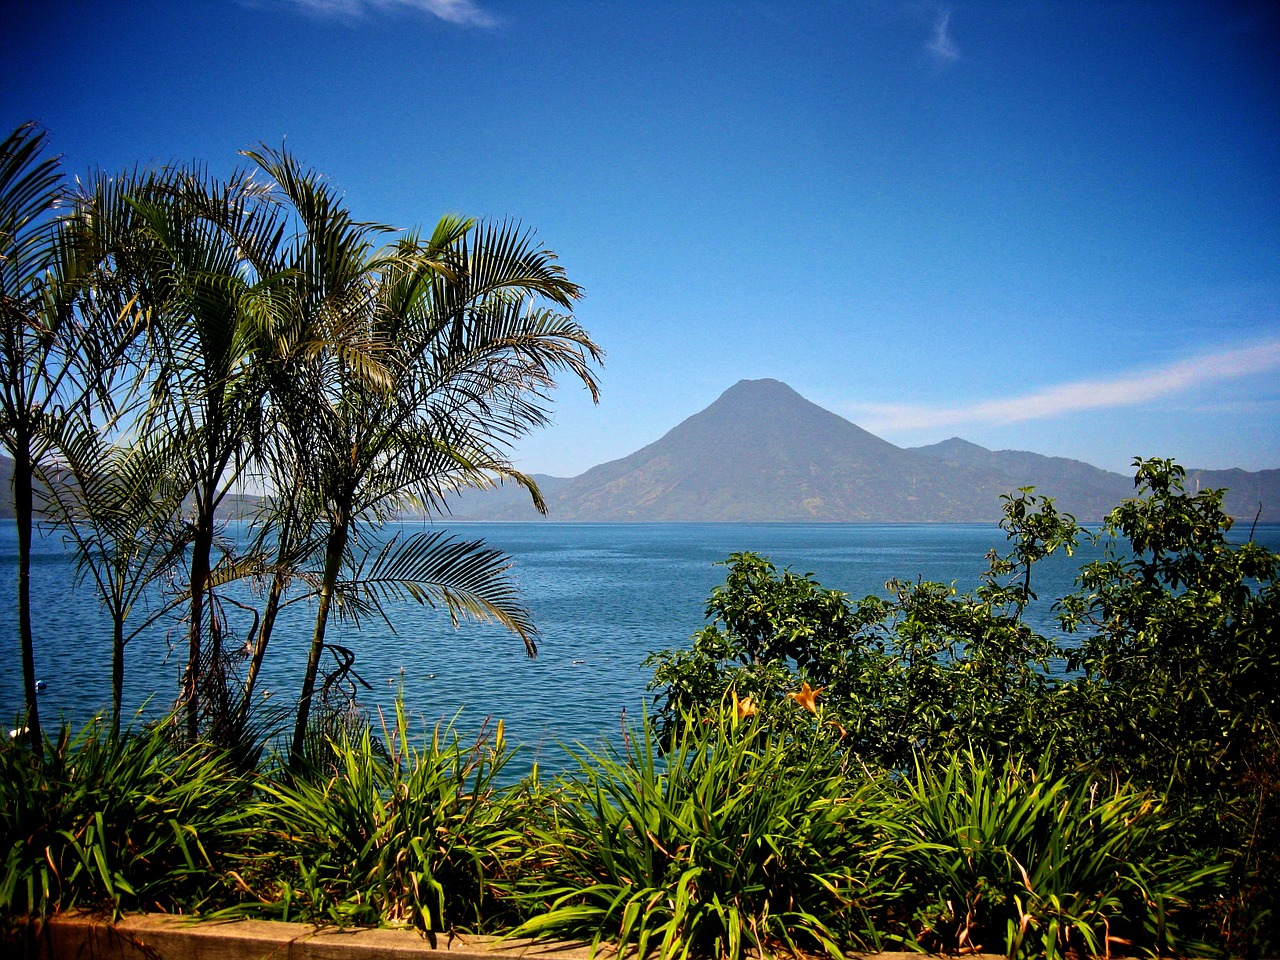 guatemala-destination-2020